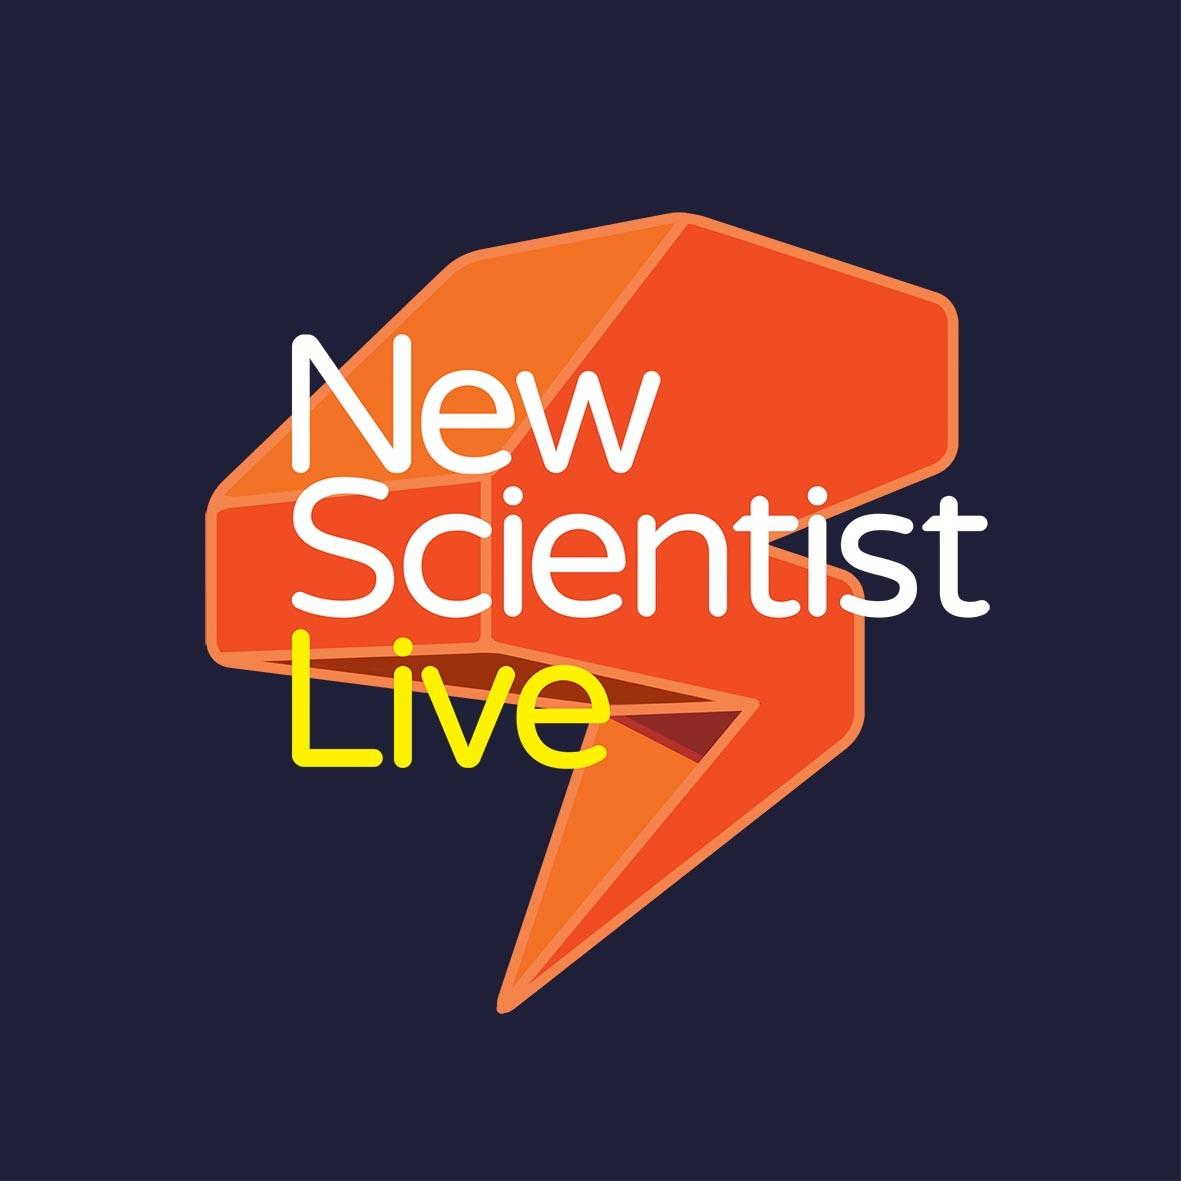 New Scientist Live 2017